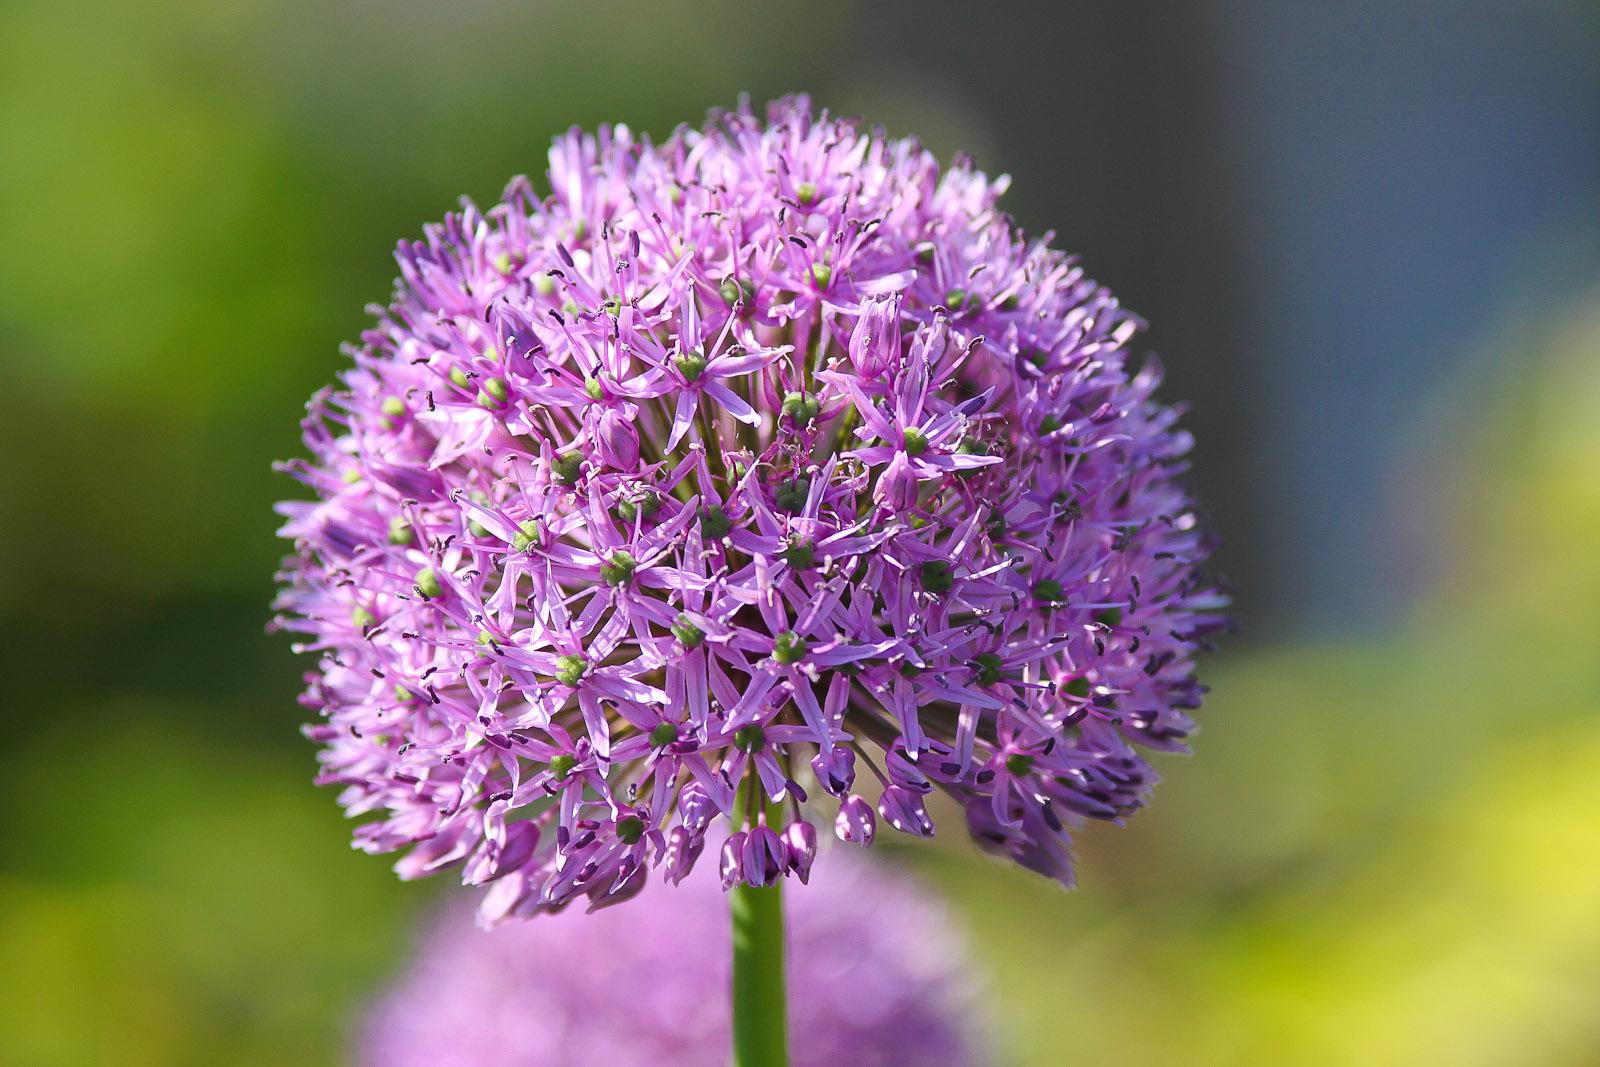 Purple Allium ion Blooming Flower in Ireland